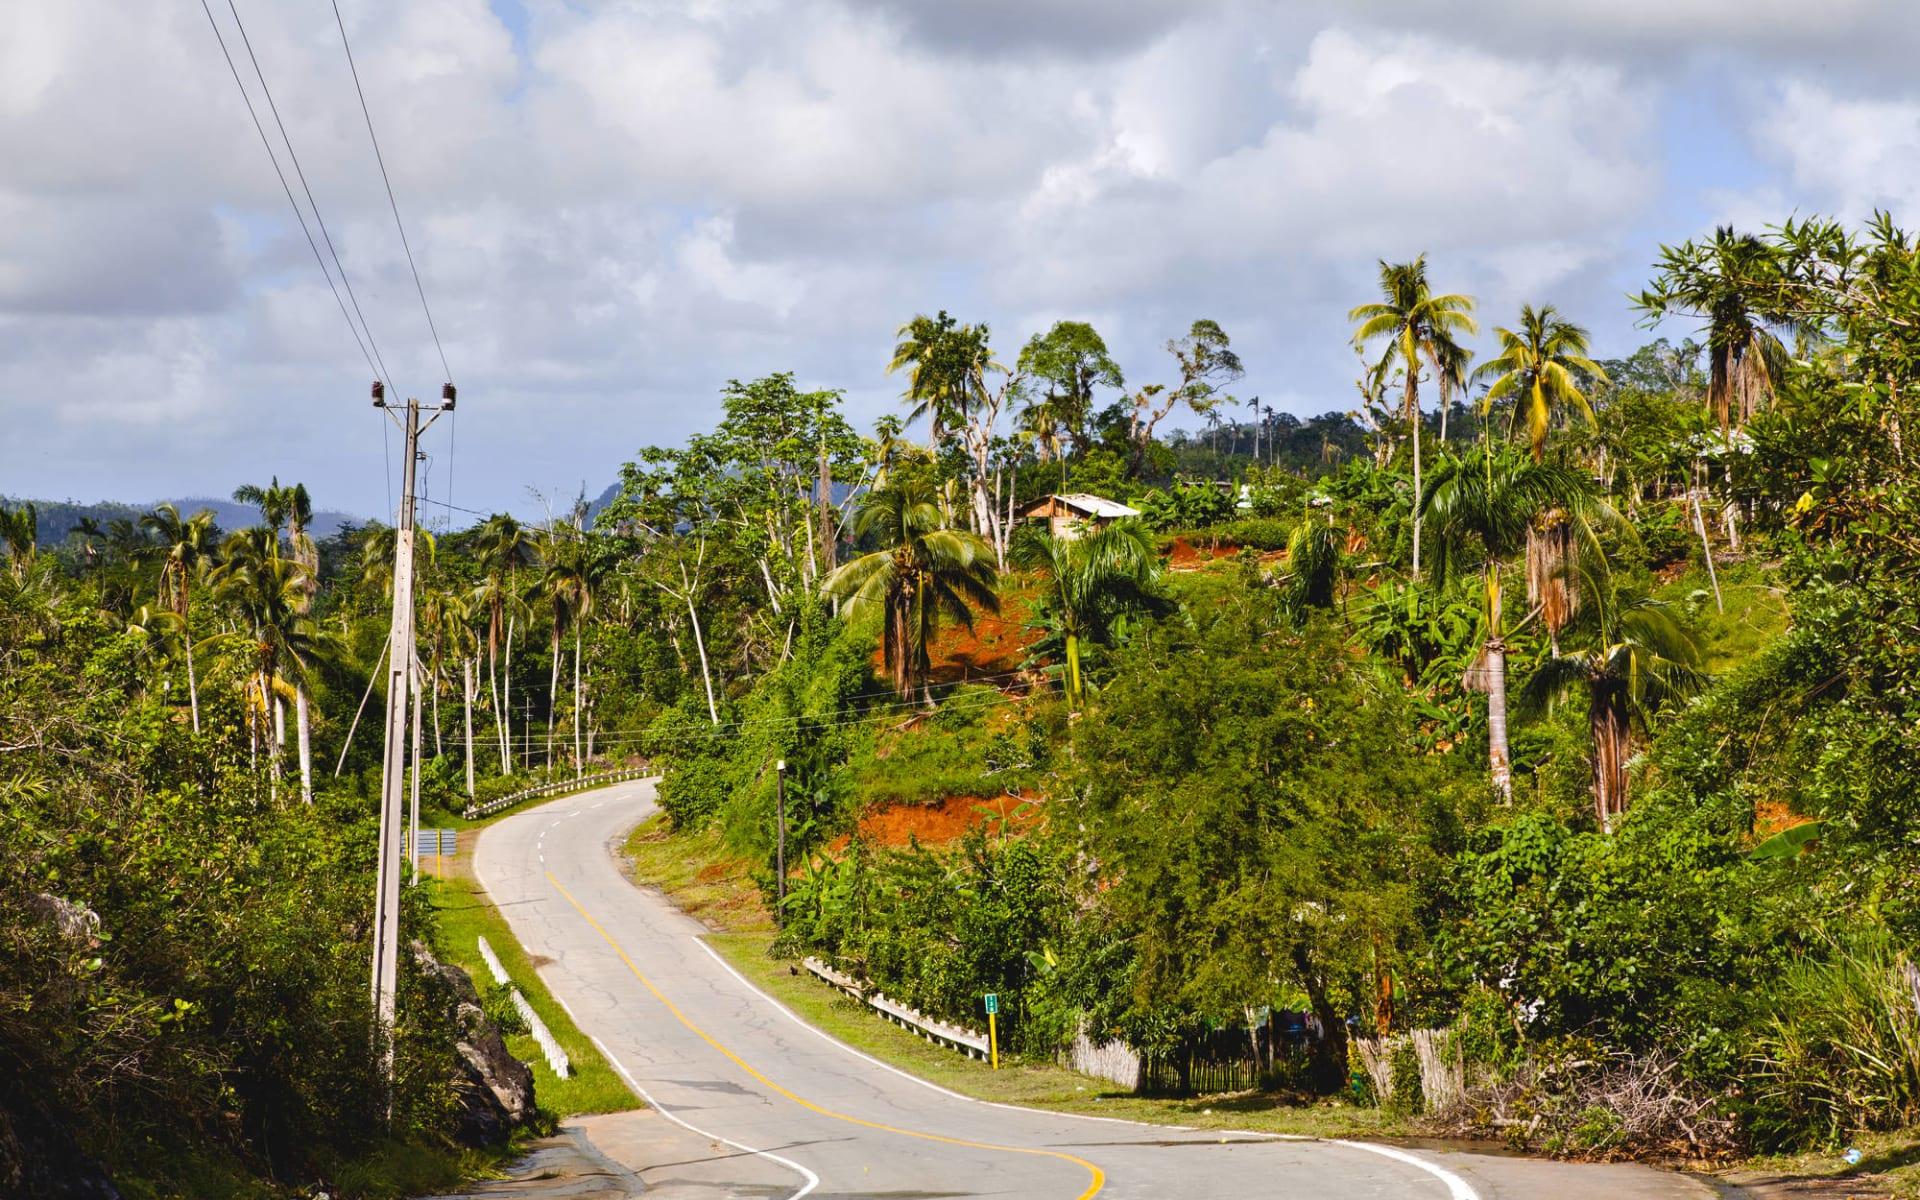 Cuba Explorer ab Havanna: Natur Baracoa - Strasse Region Baracoa - c